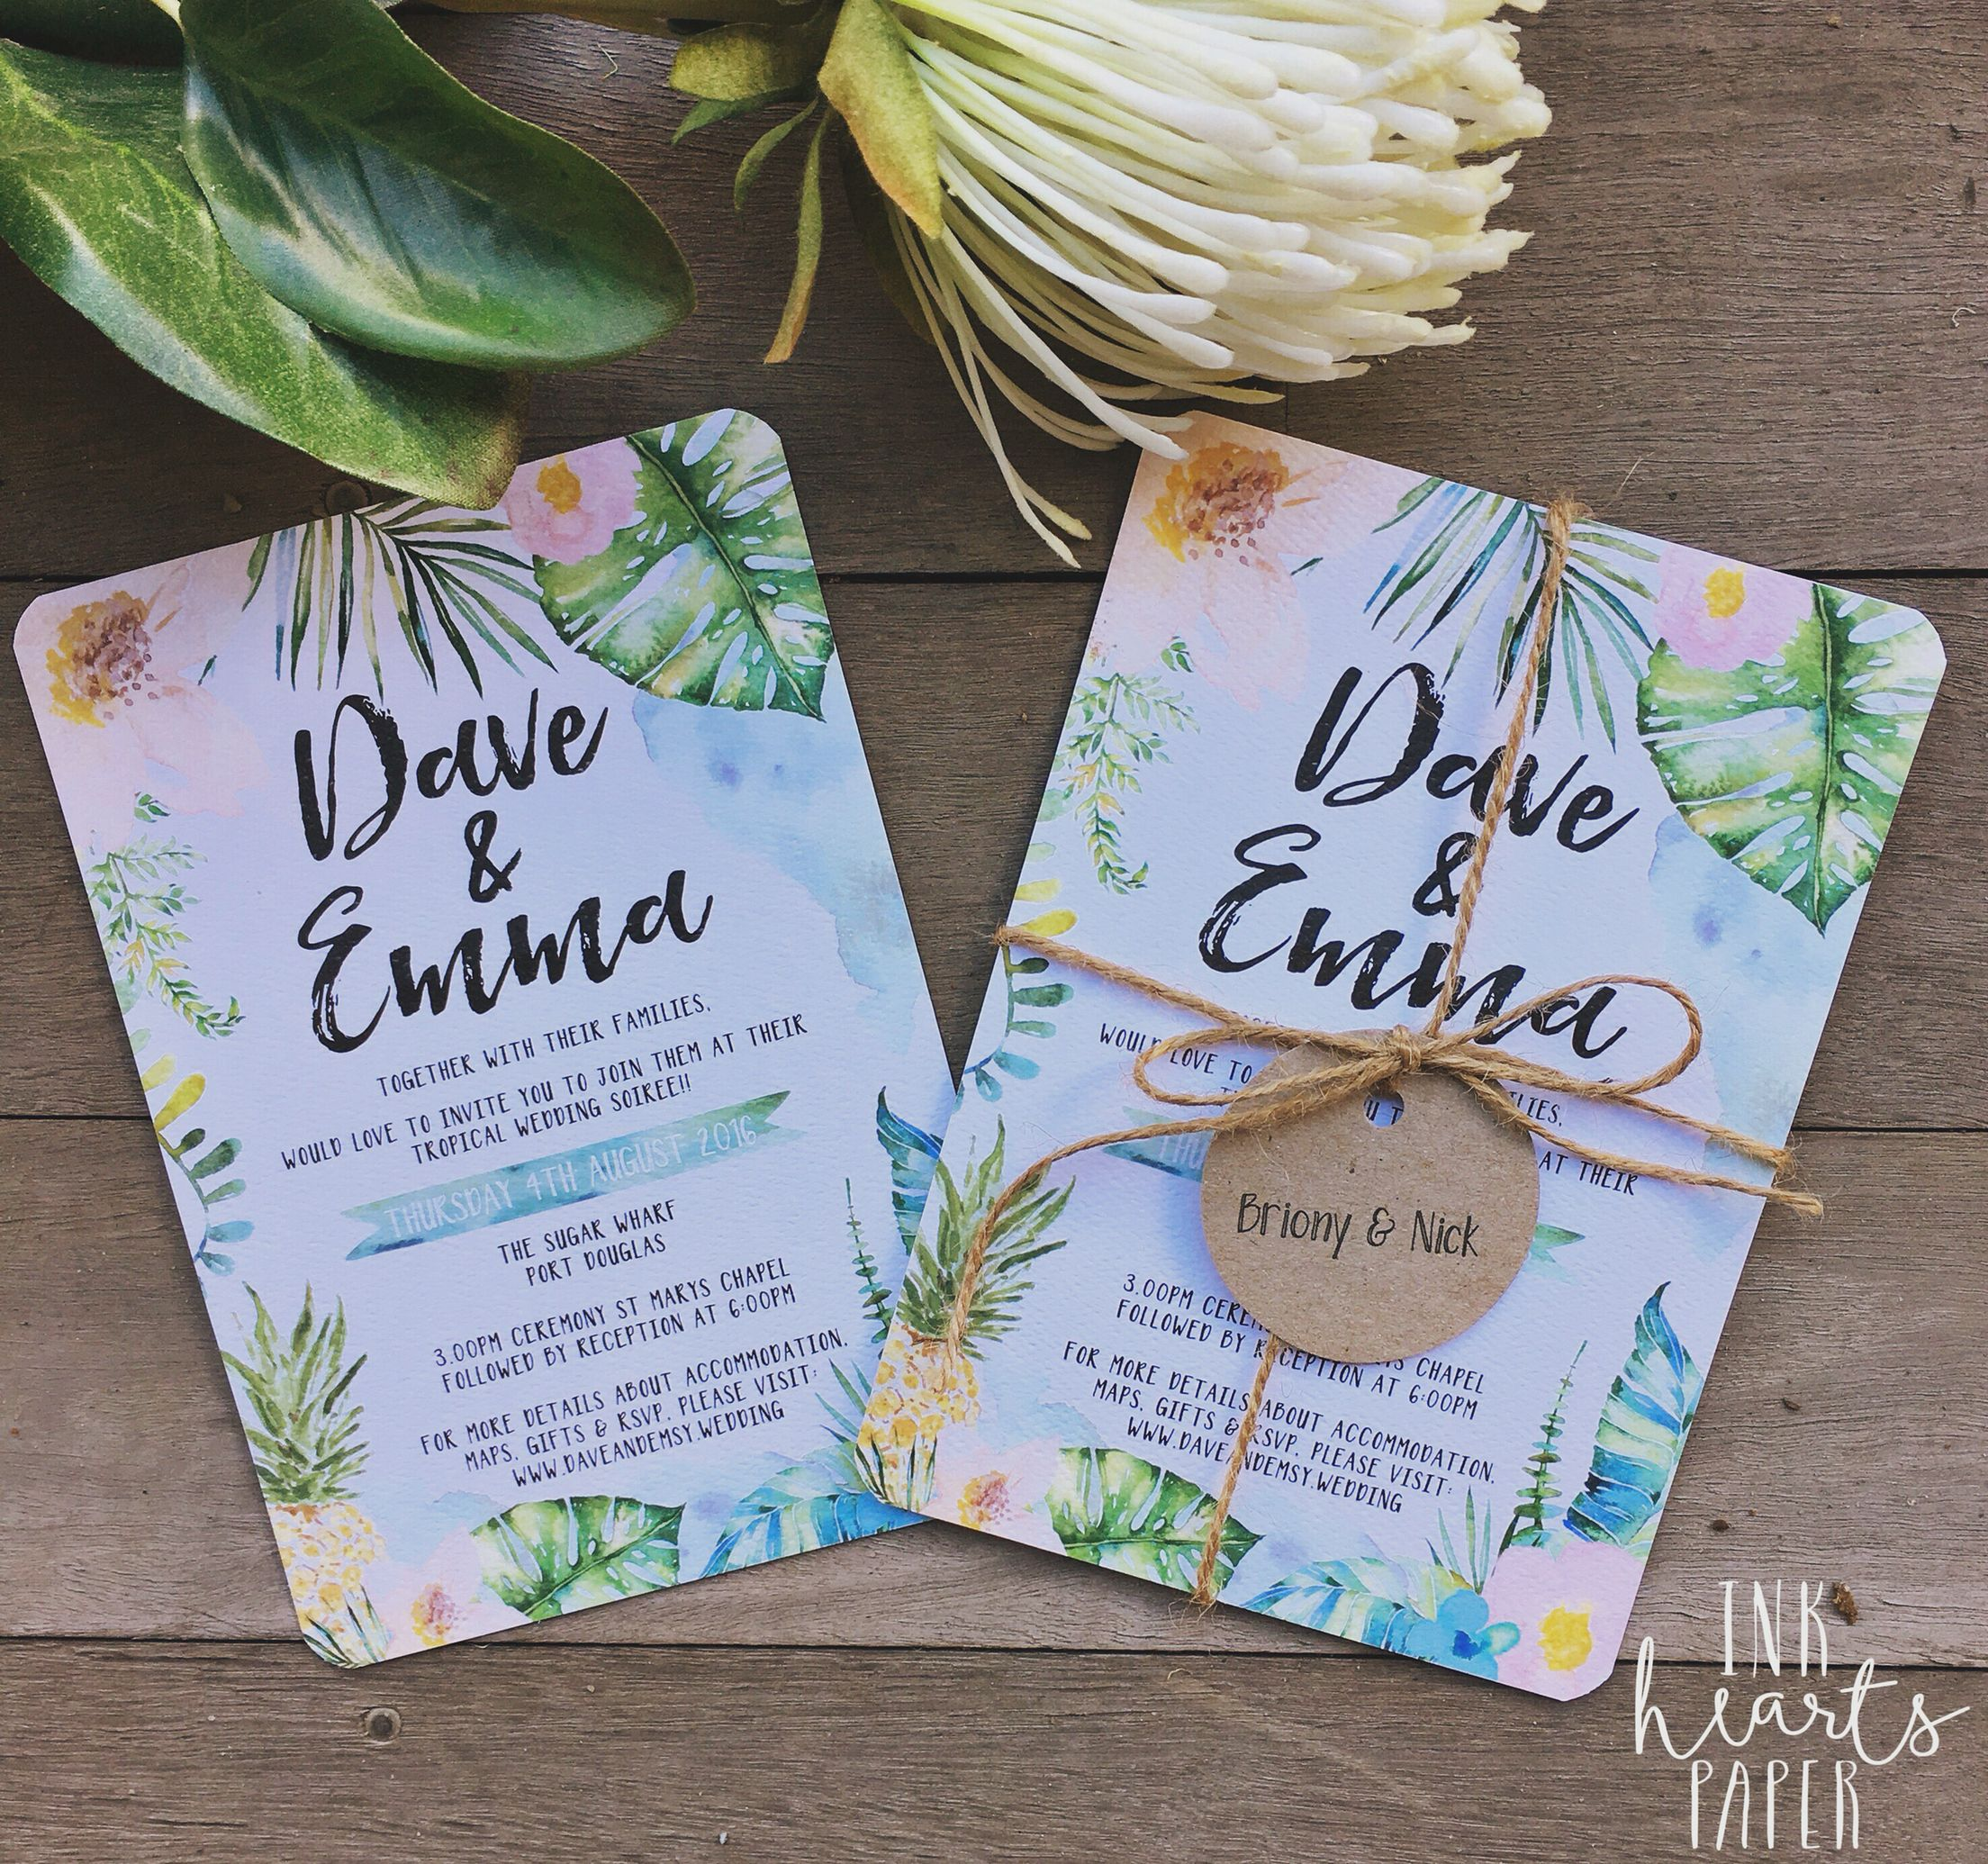 Wedding engagement invitation stationery modern classy professional ...